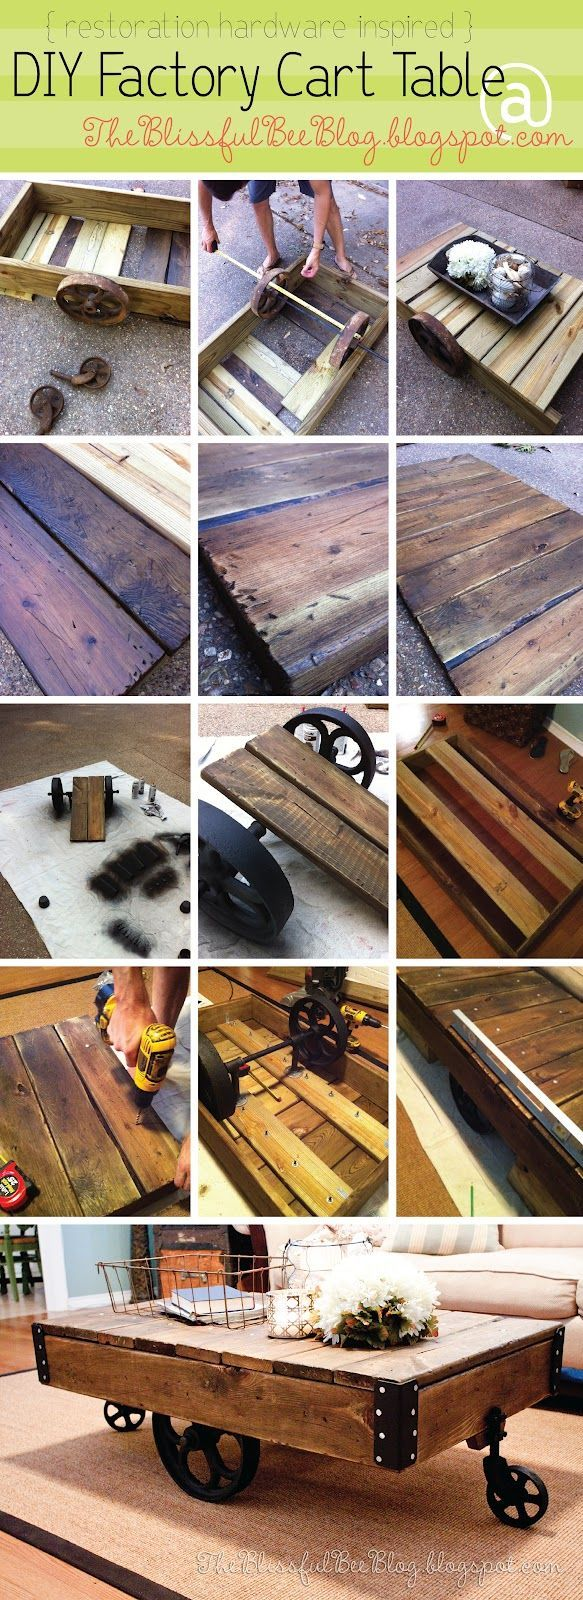 Info's : DIY Restoration Hardware Hacks! (part 1)